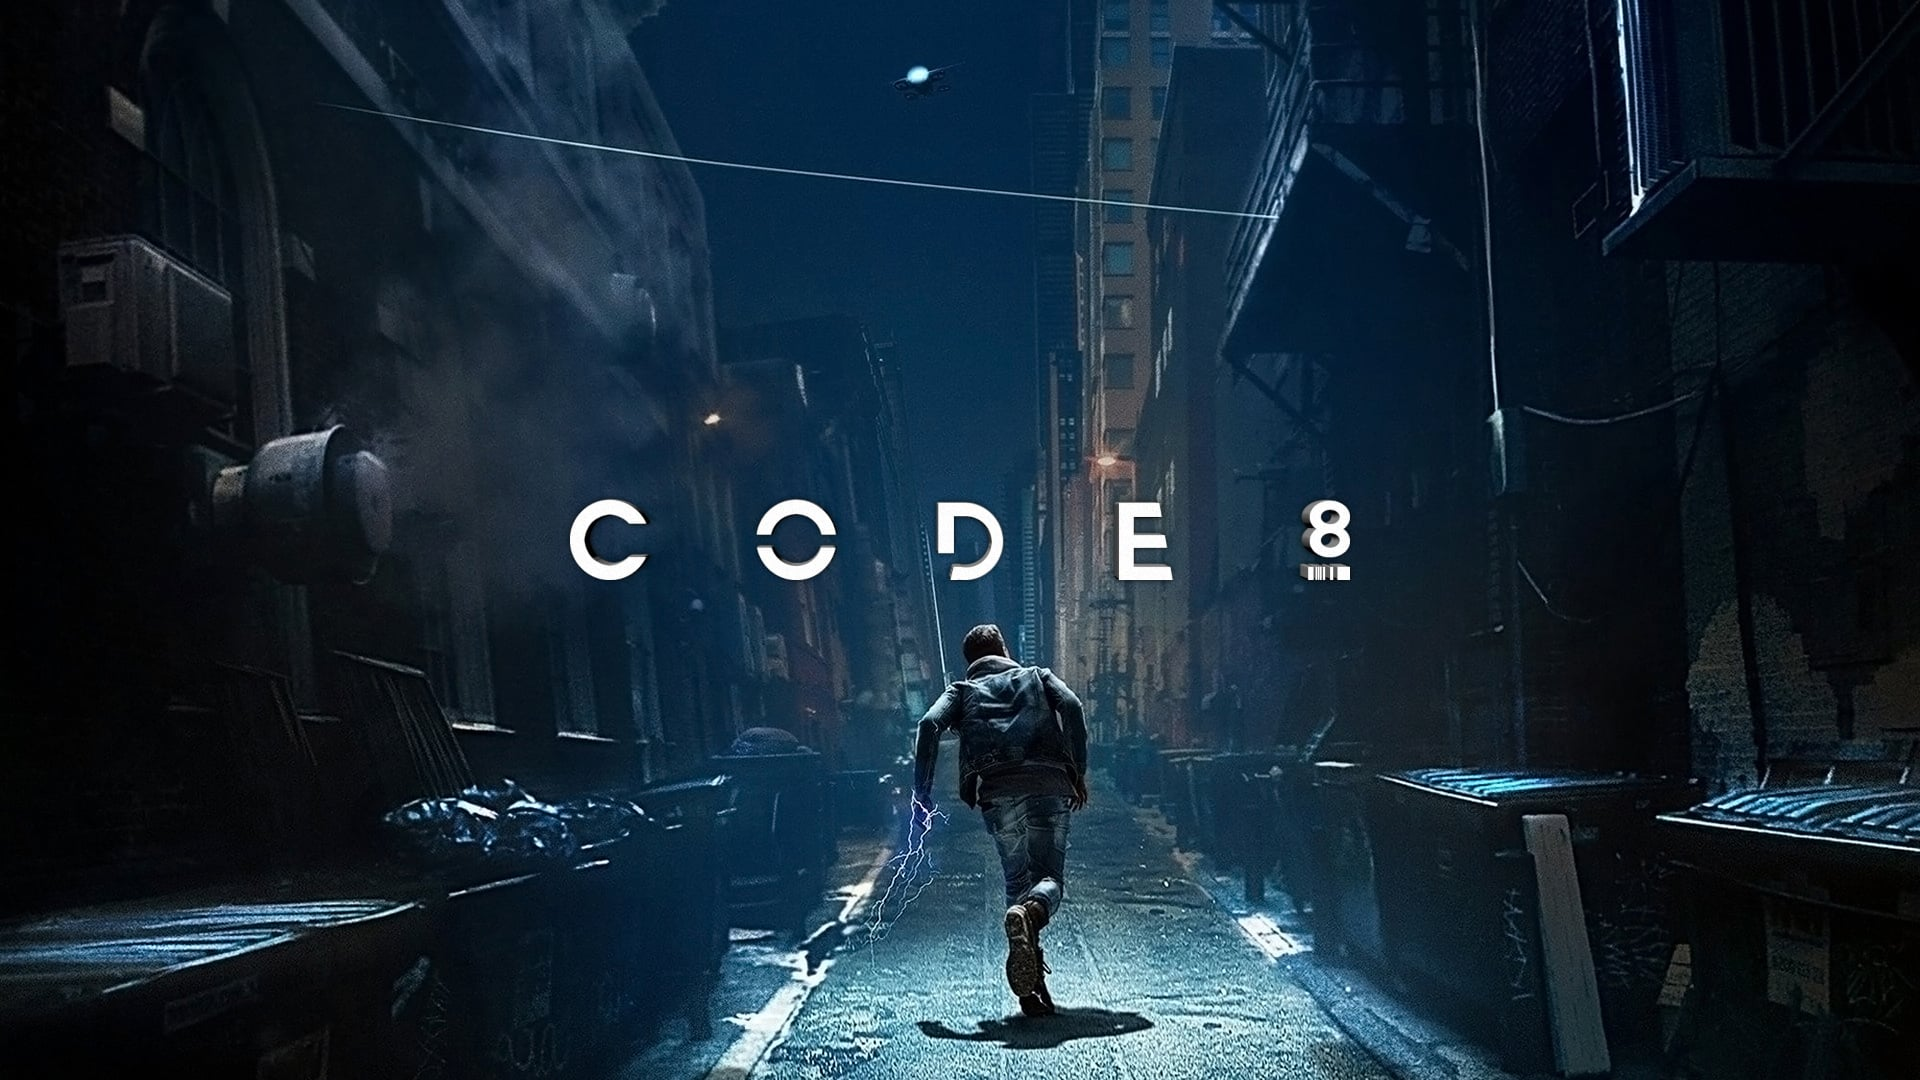 Code 8 ล่าคนโคตรพลัง รีวิว ดูหนังออนไลน์